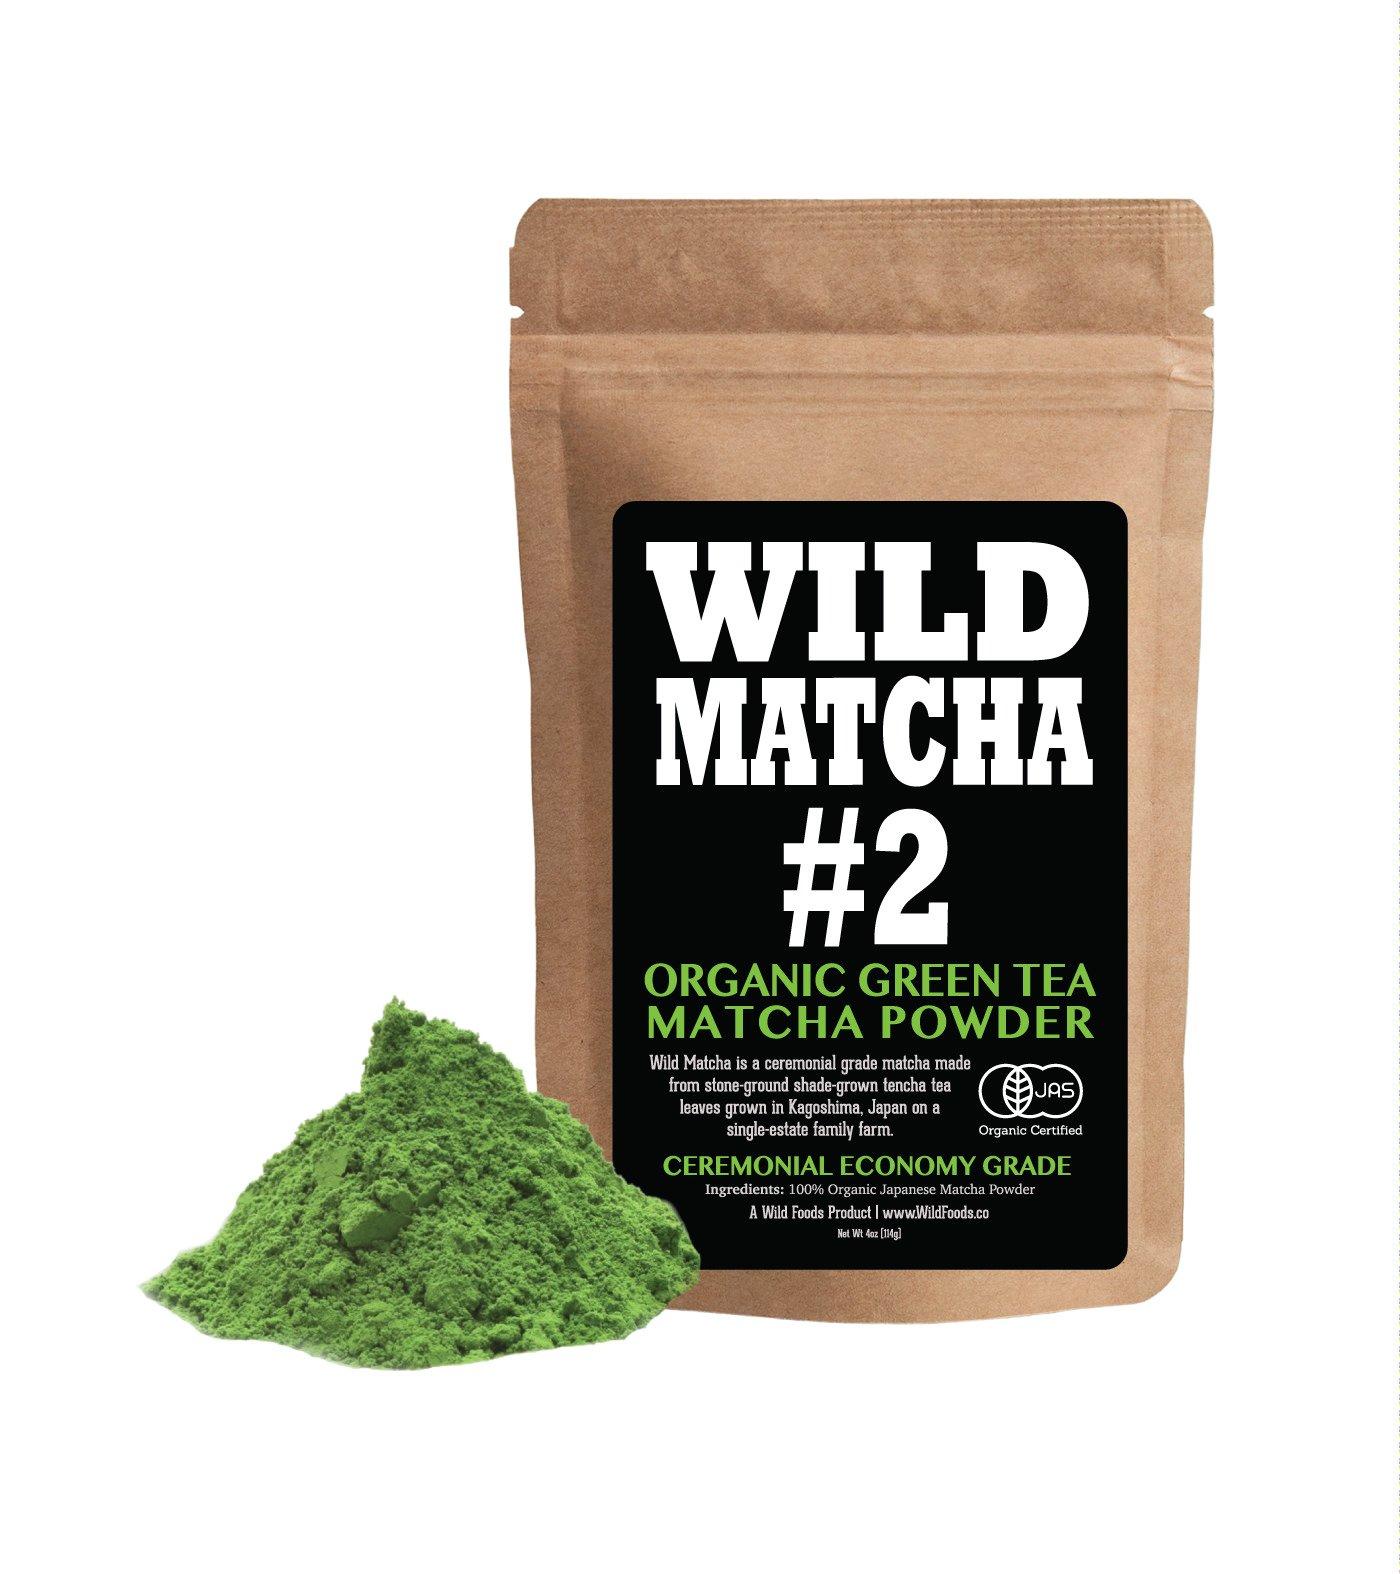 Organic Matcha Green Tea Powder, Wild Matcha #2 Ceremonial Grade, Authentic Japanese Matcha Grown In The Mountains of Kyoto, Japan, JAS Certified Organic (4 ounce)